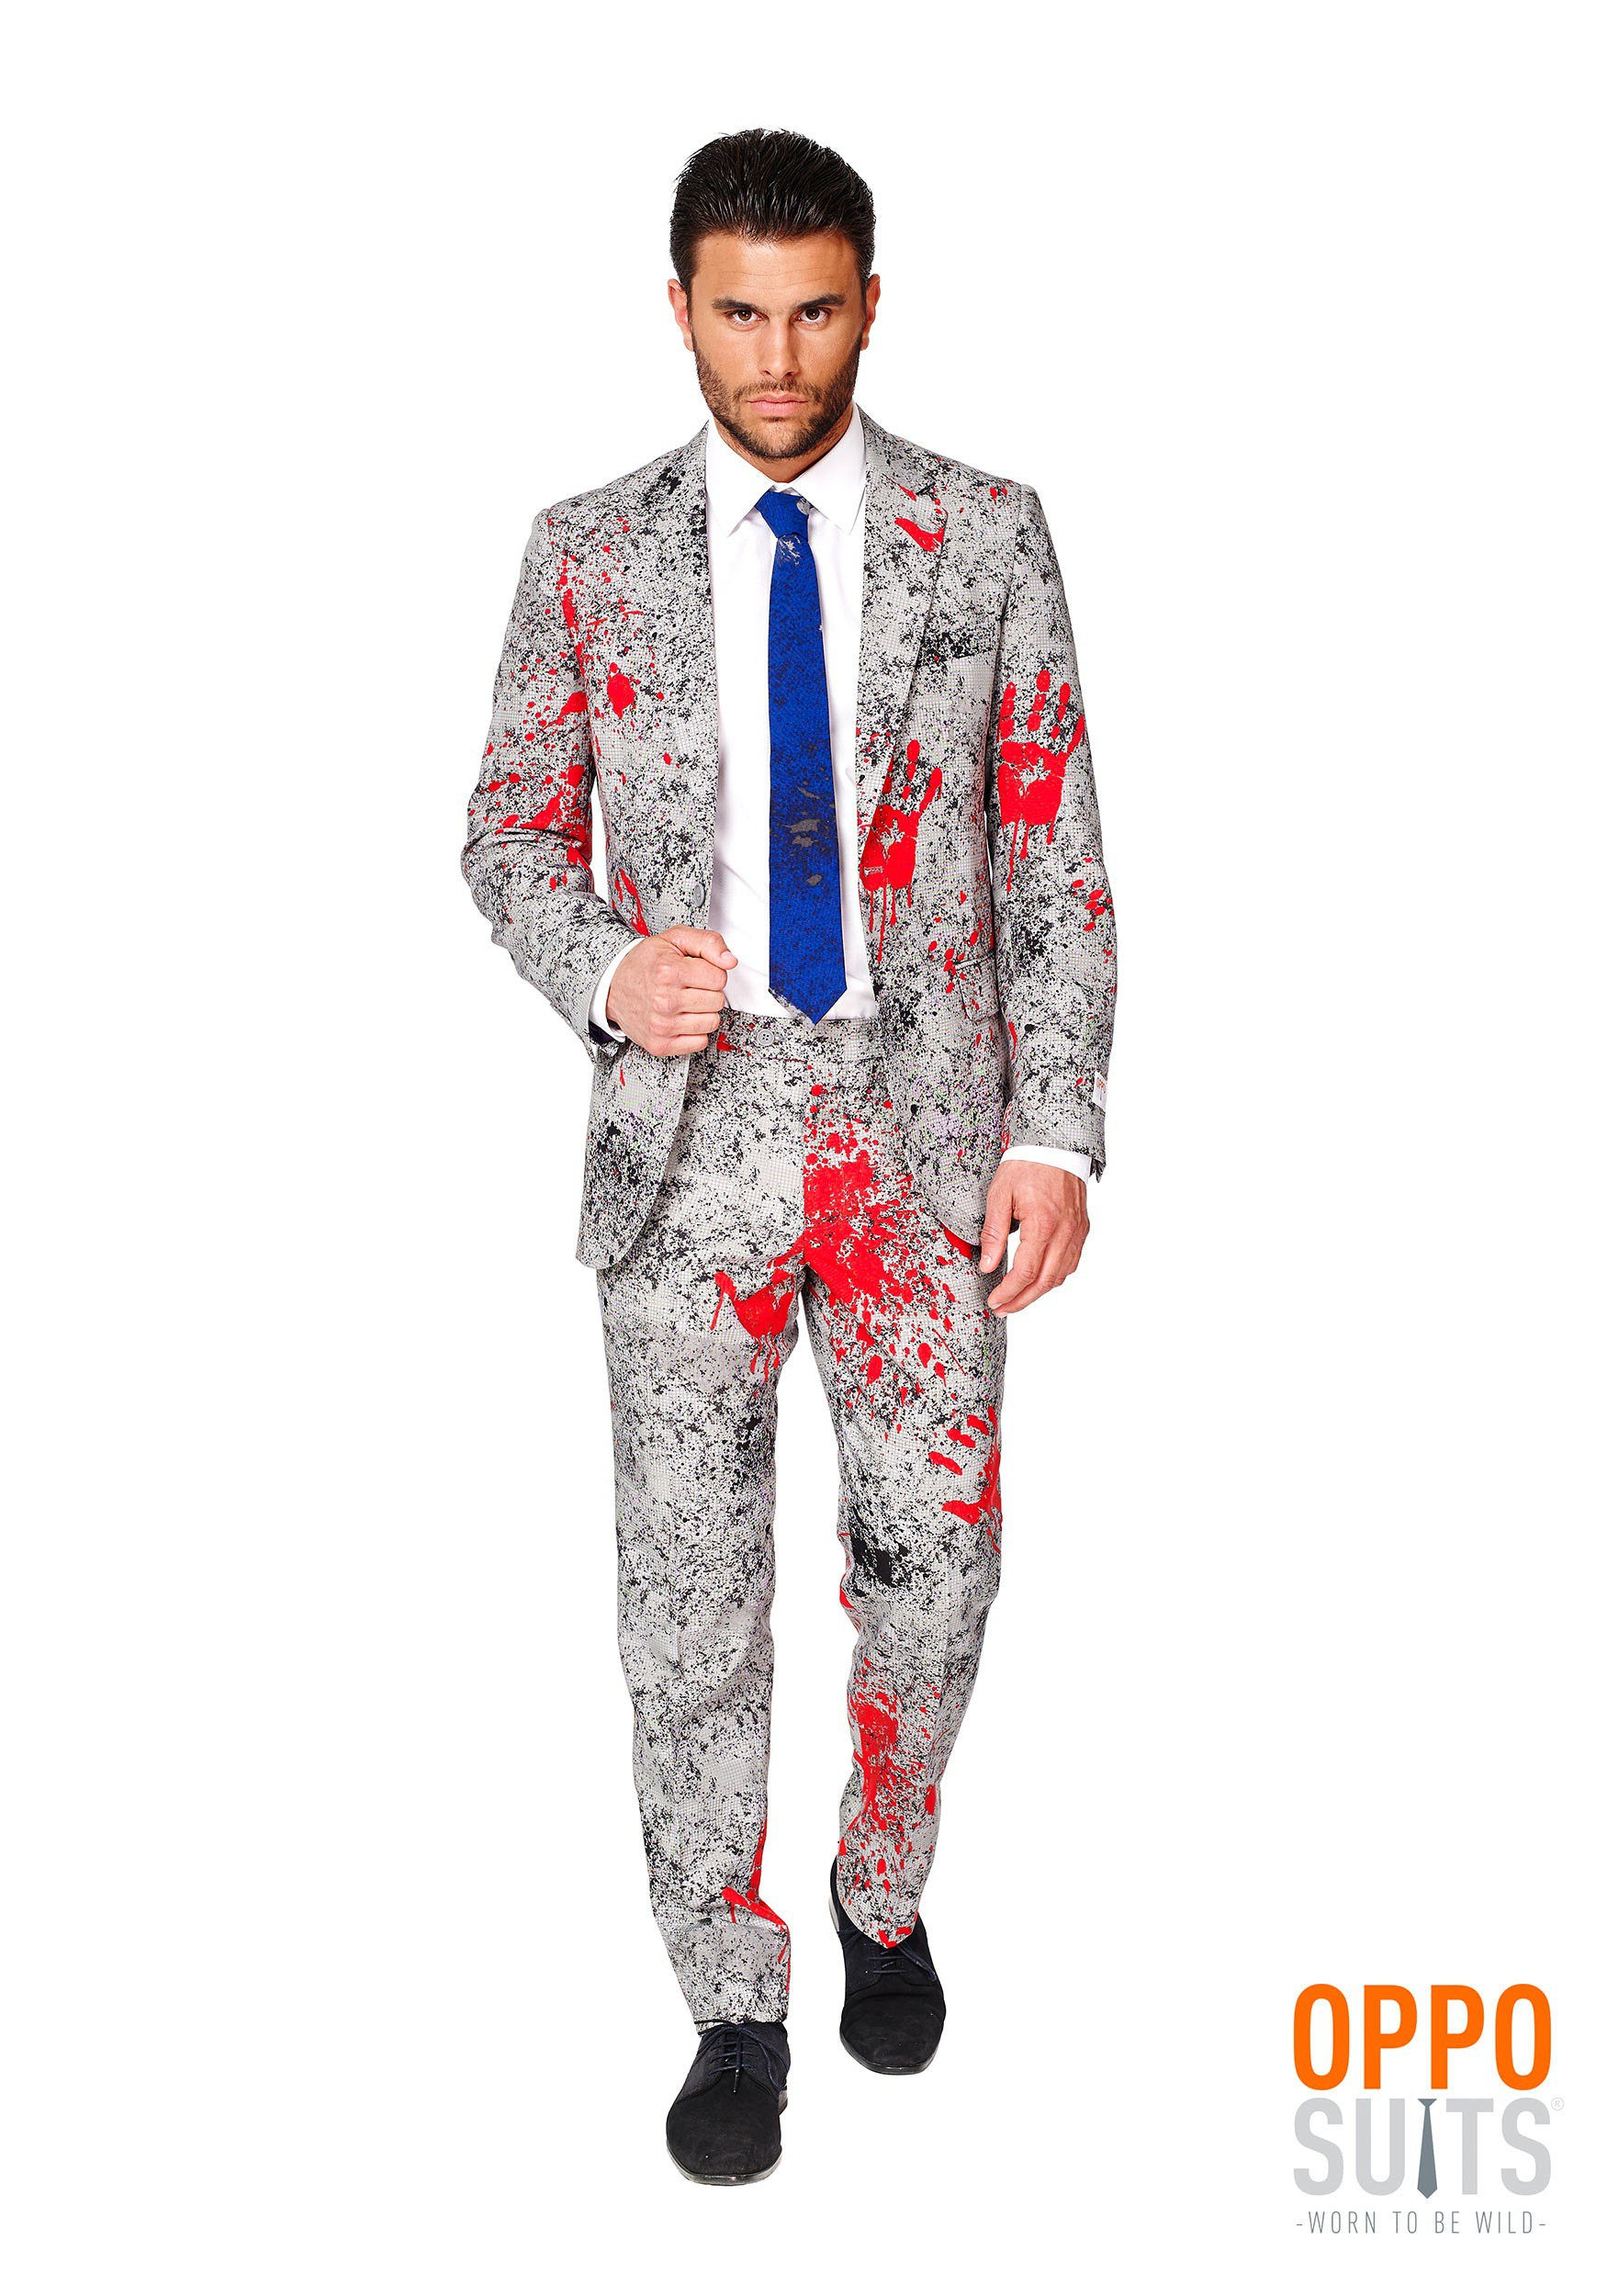 OppoSuits Zombiac Suit for Men